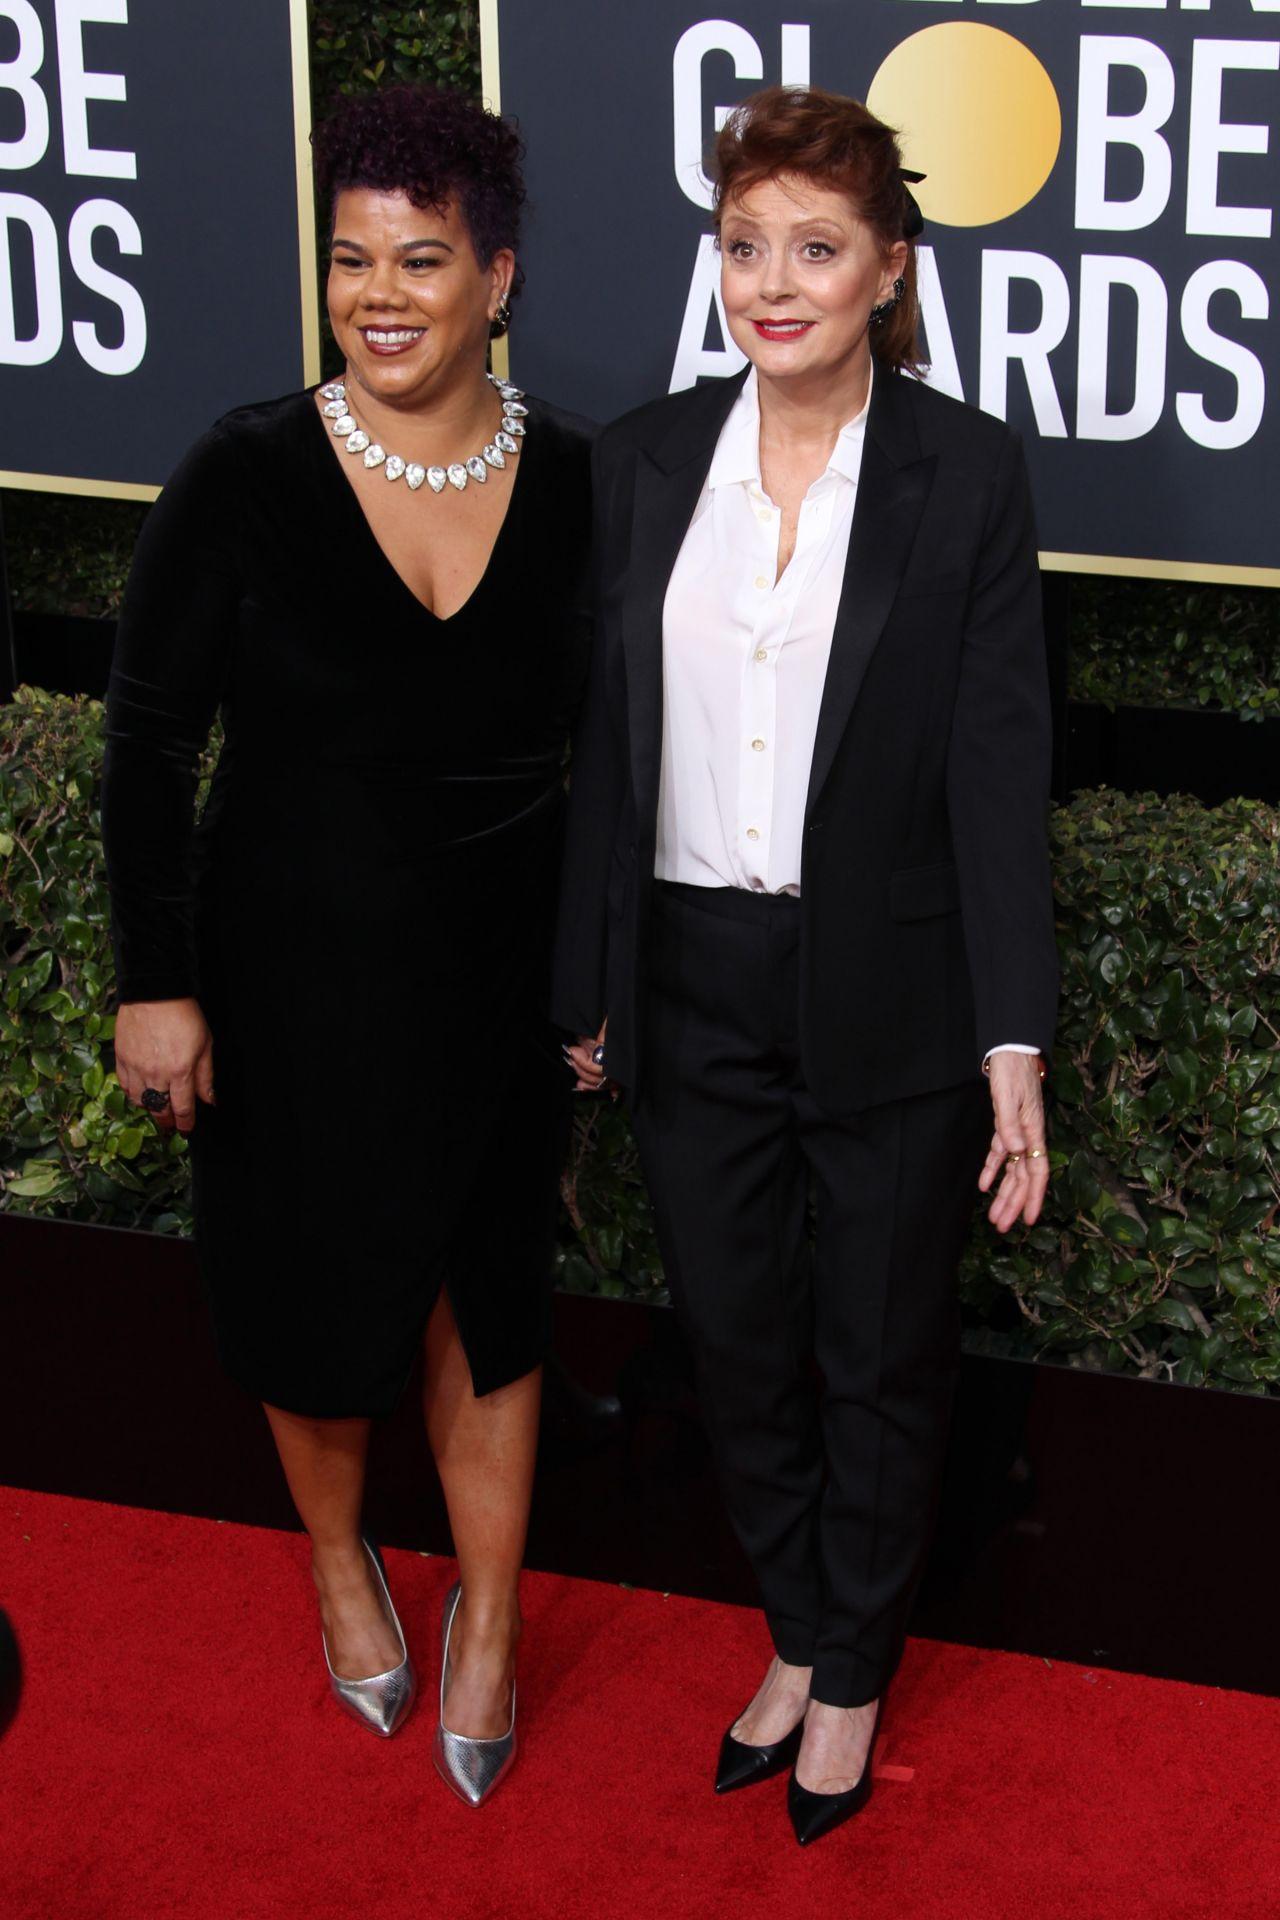 http://celebmafia.com/wp-content/uploads/2018/01/susan-sarandon-golden-globe-awards-2018-5.jpg